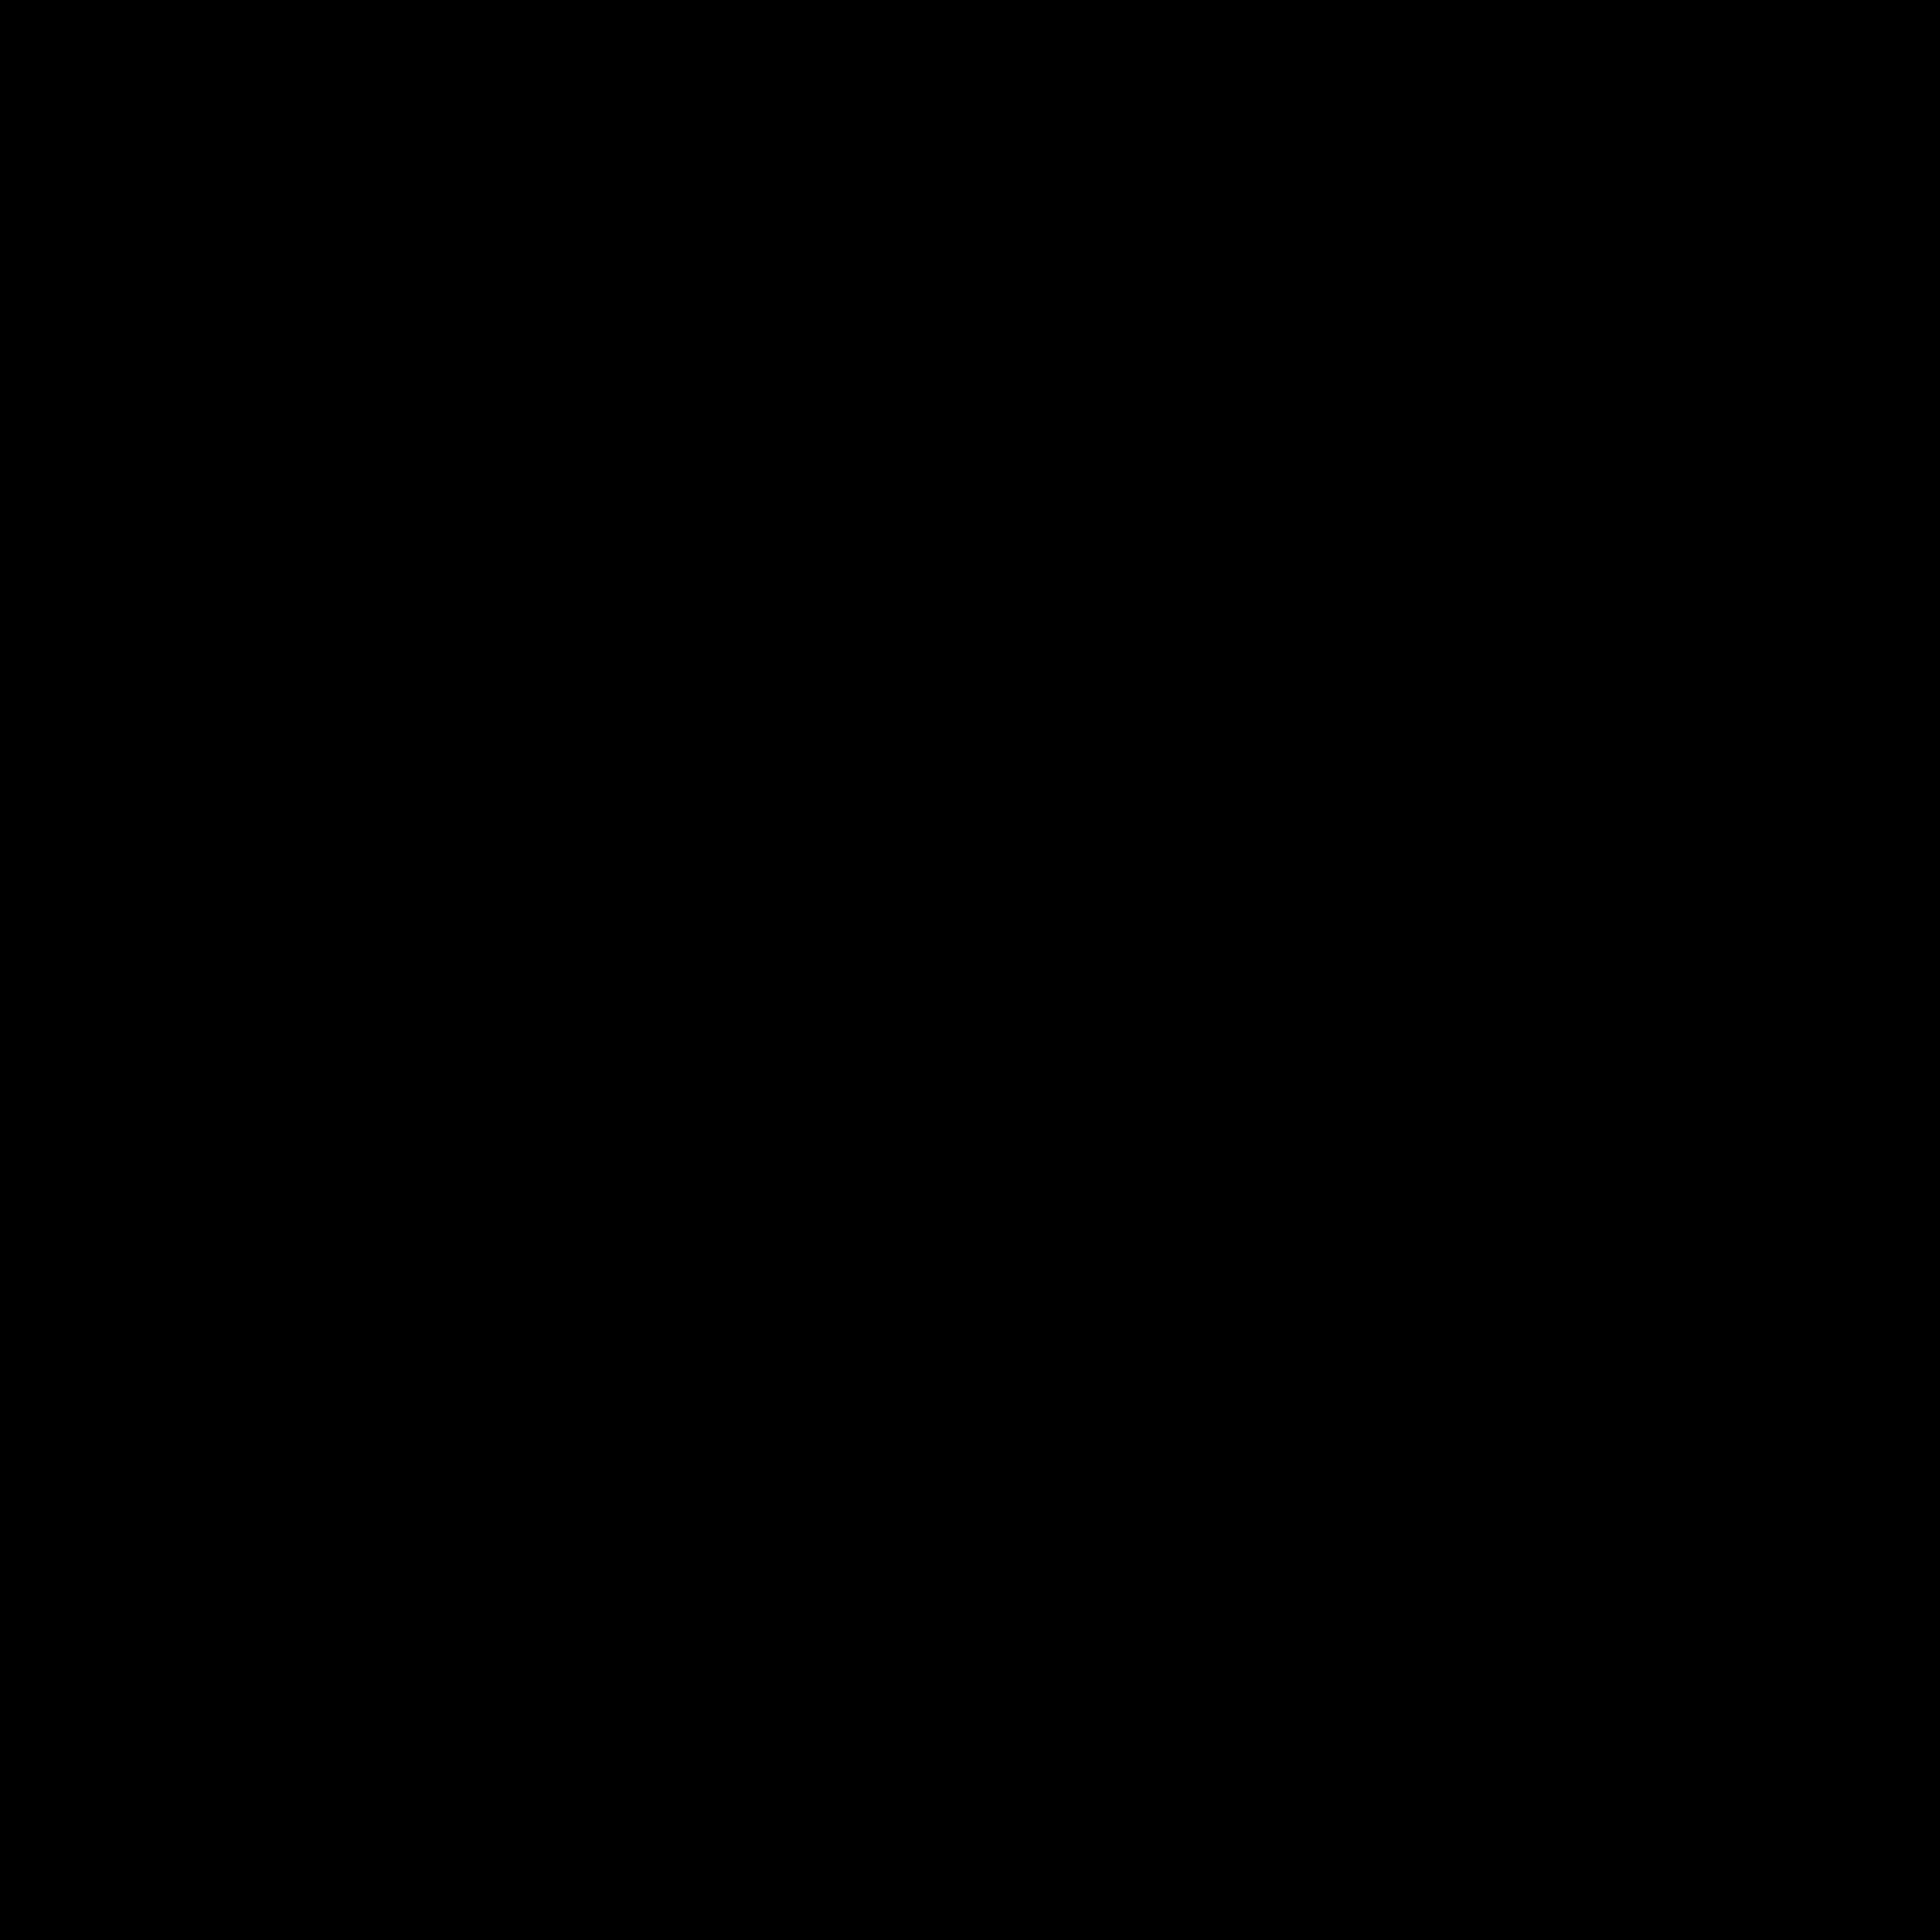 Black woman at getdrawings. Pearl clipart silhouette